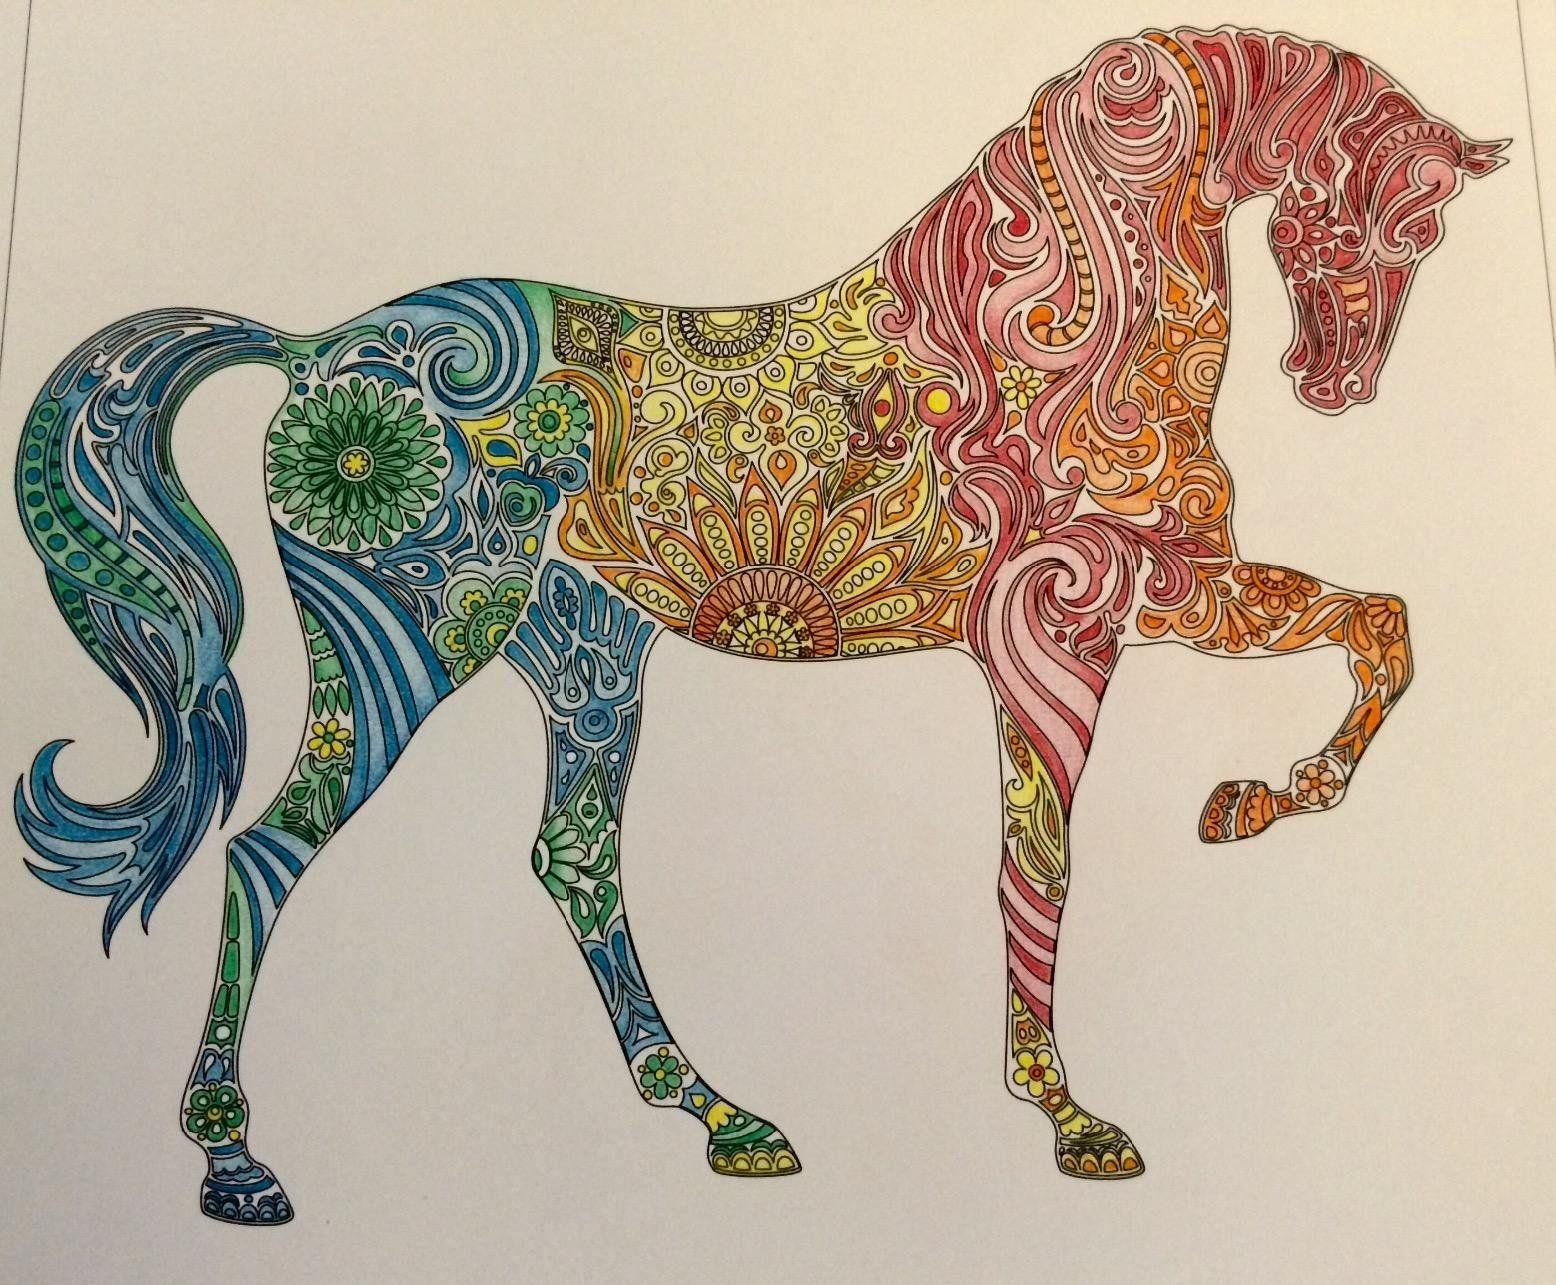 Coloring books to destress - Amazon Com Vive Le Color Horses Adult Coloring Book Color